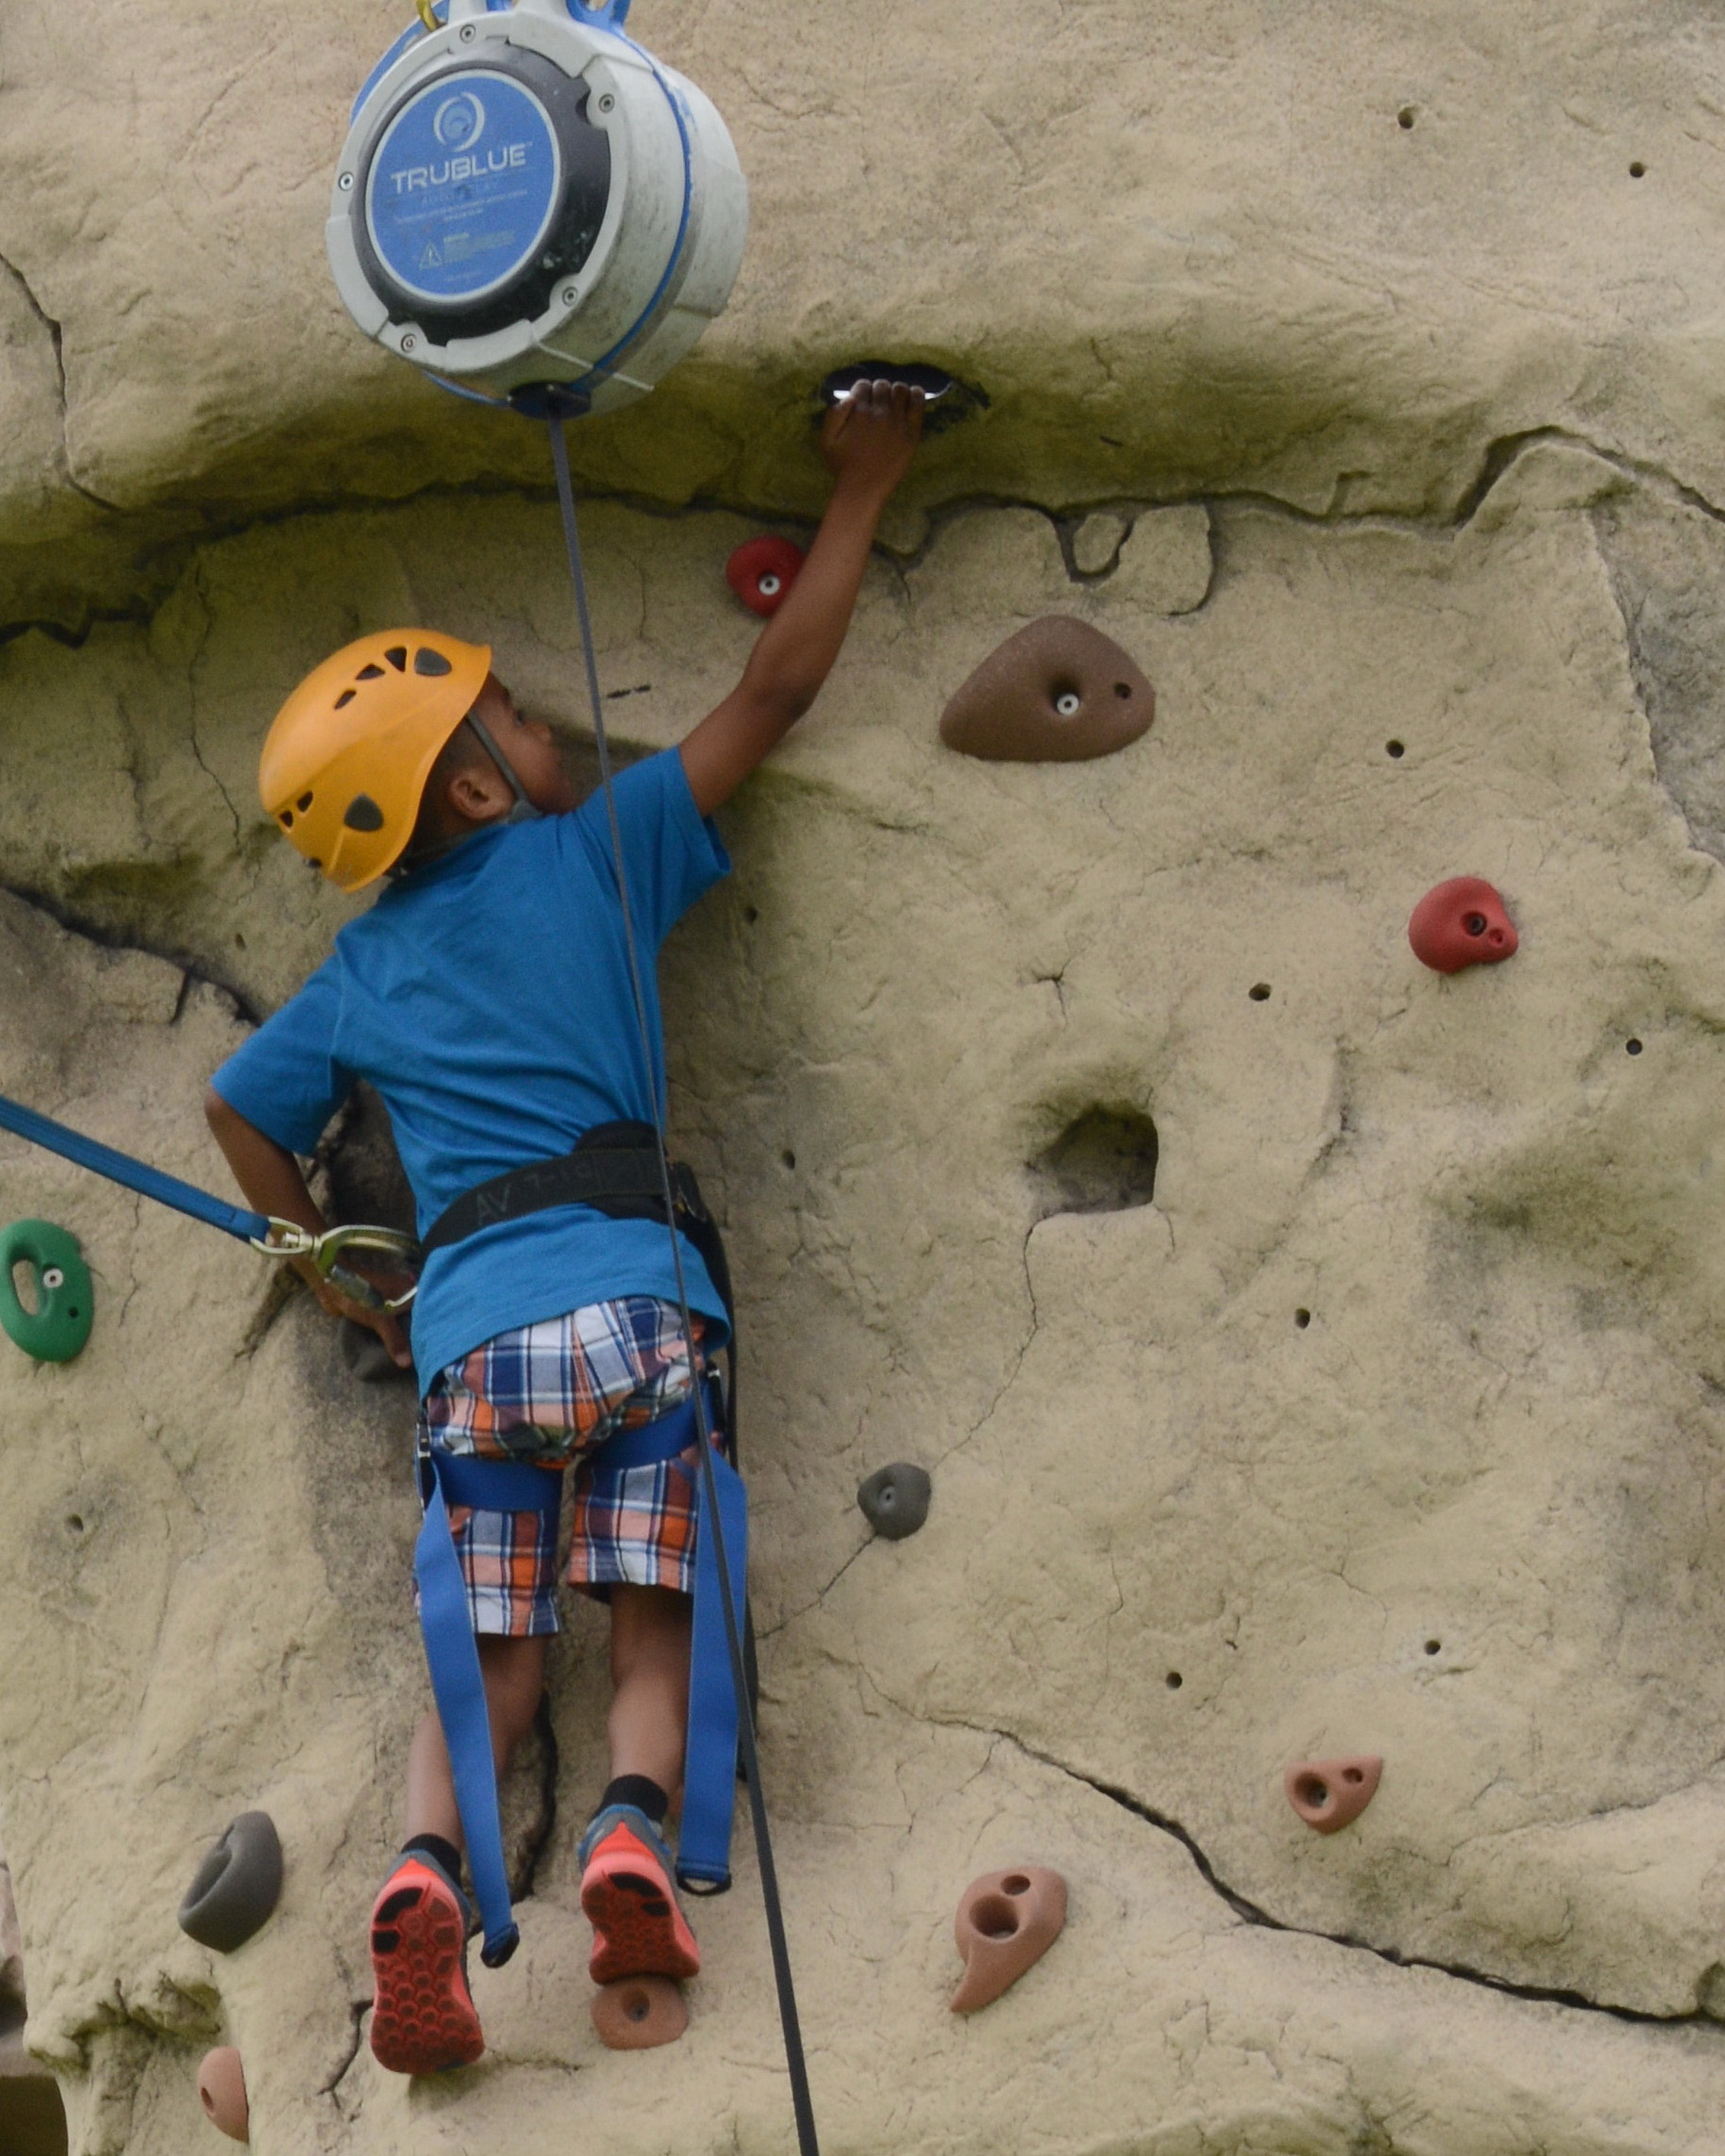 Outdoor Rec Offers Activities To Get Into The Swing Of Summer